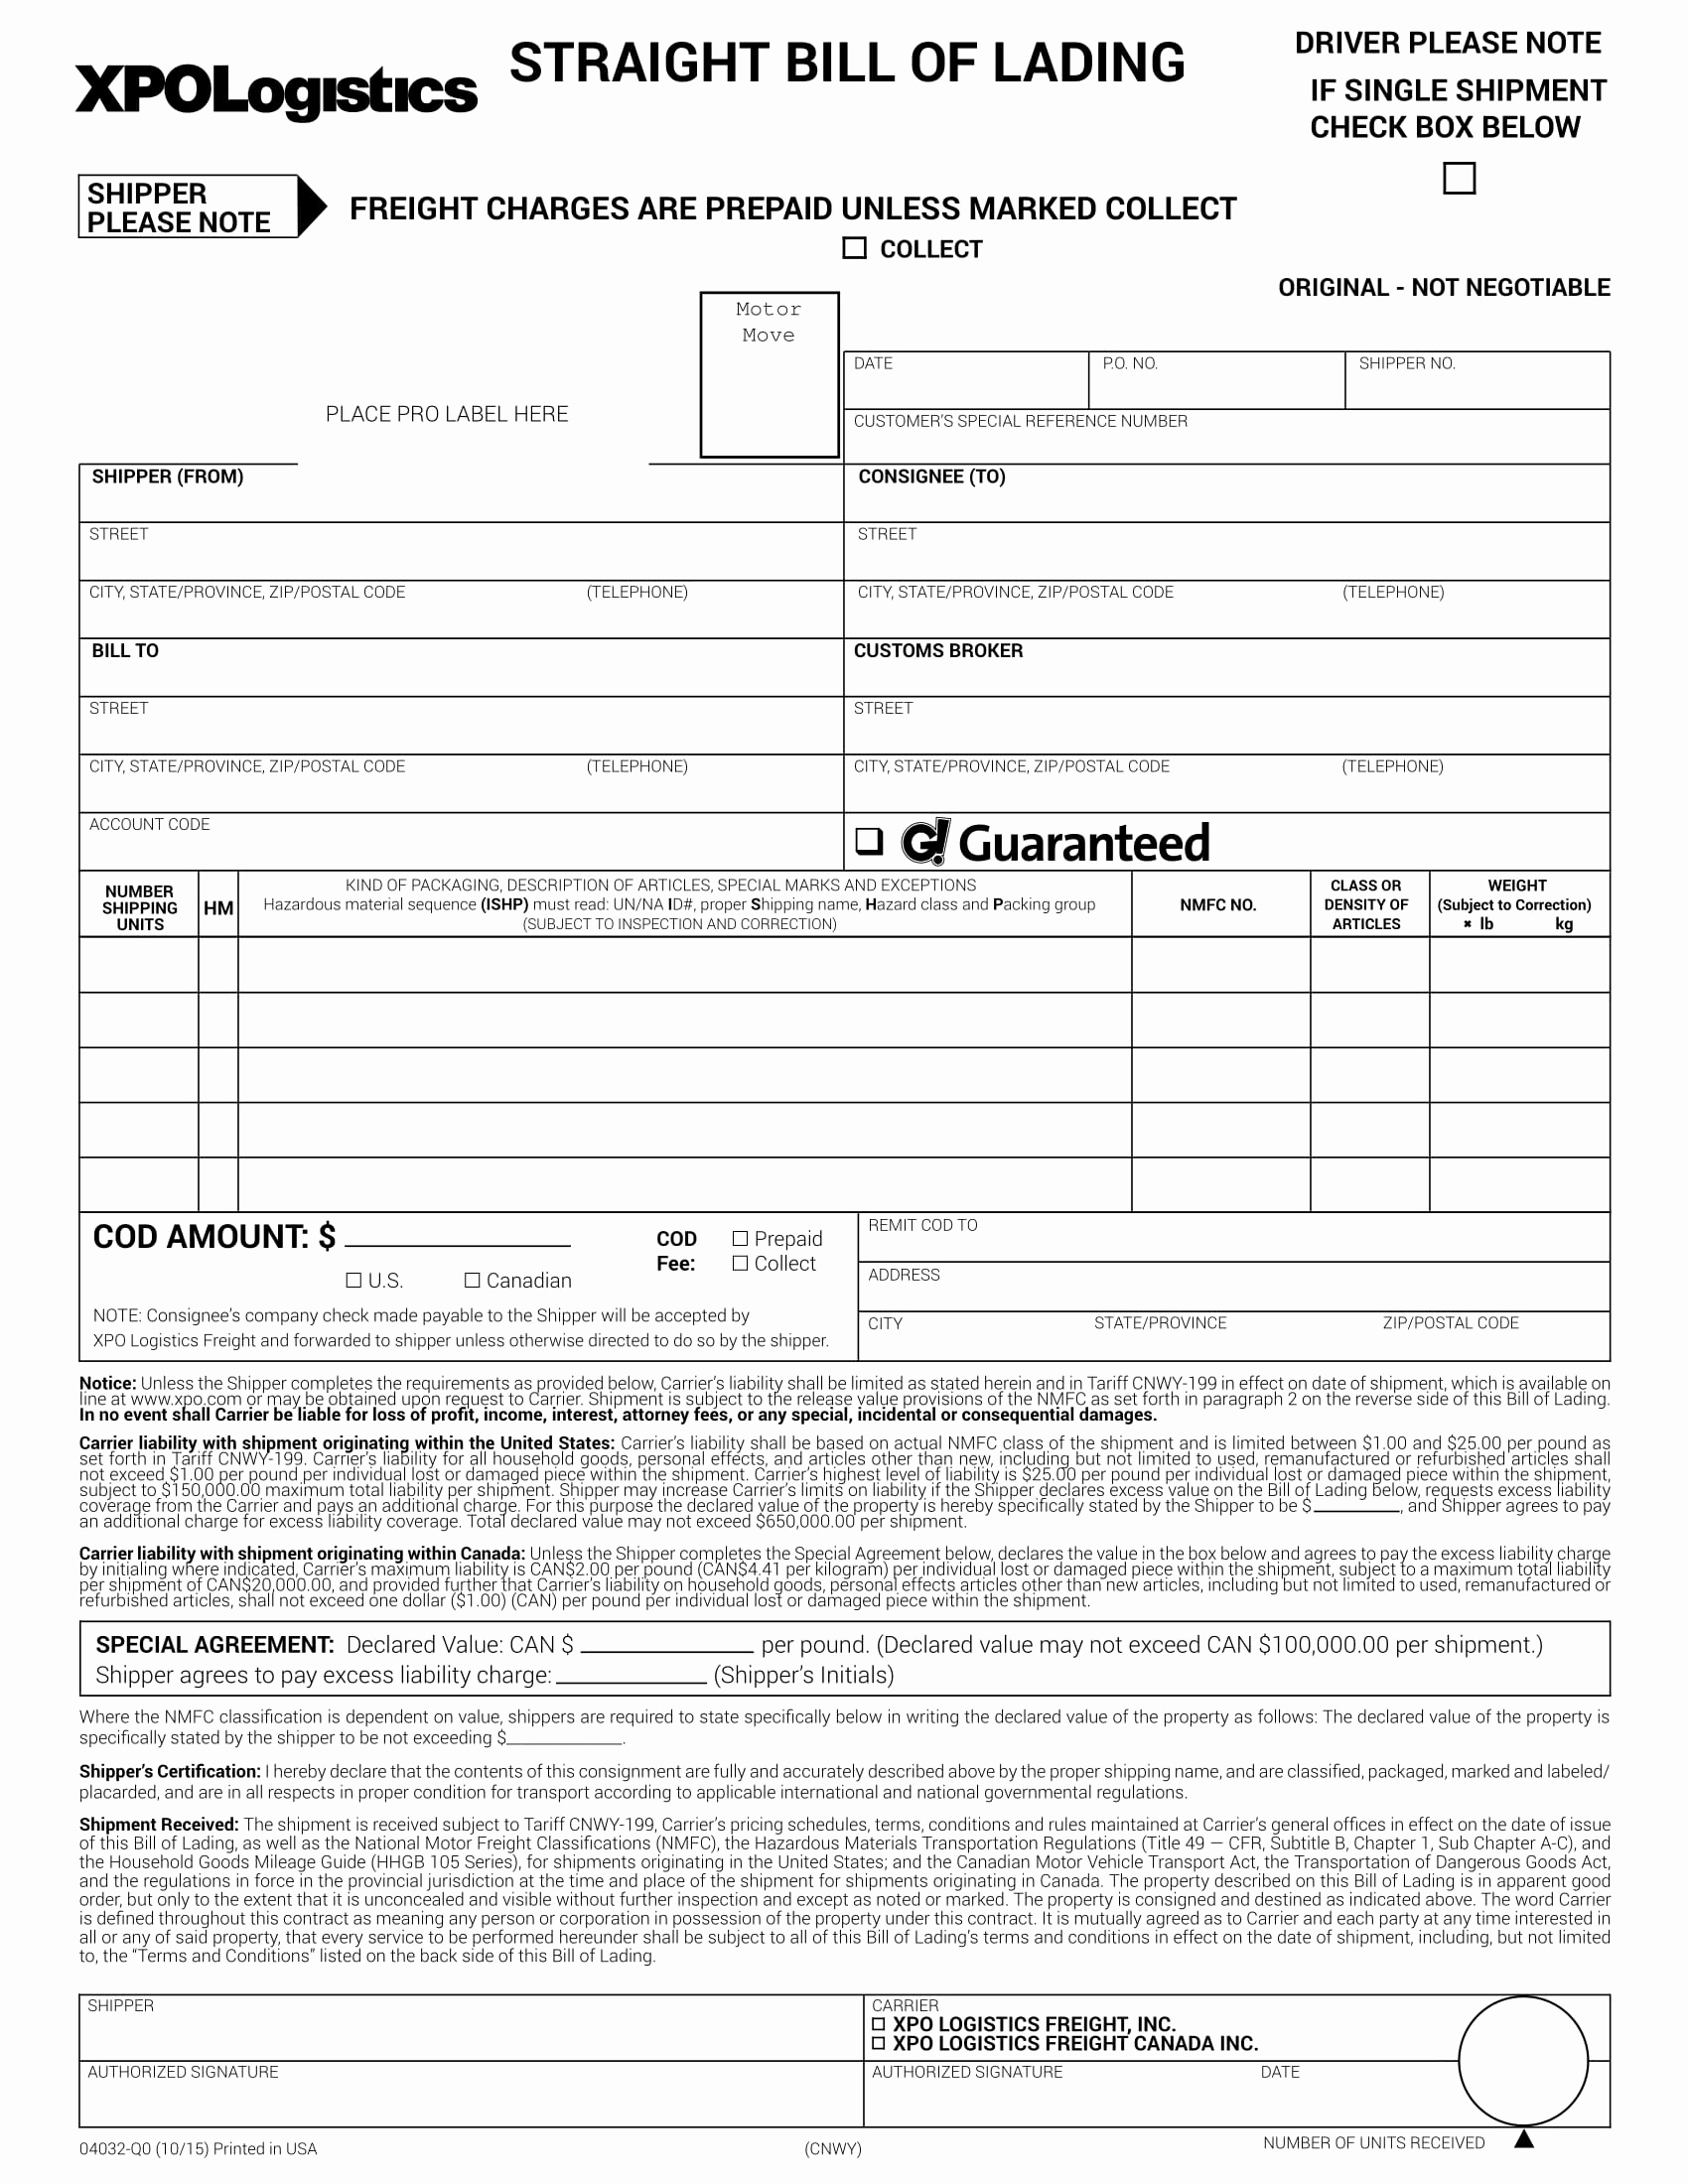 Generic Bill Of Lading Luxury 9 Generic Bill Of Lading Examples Pdf